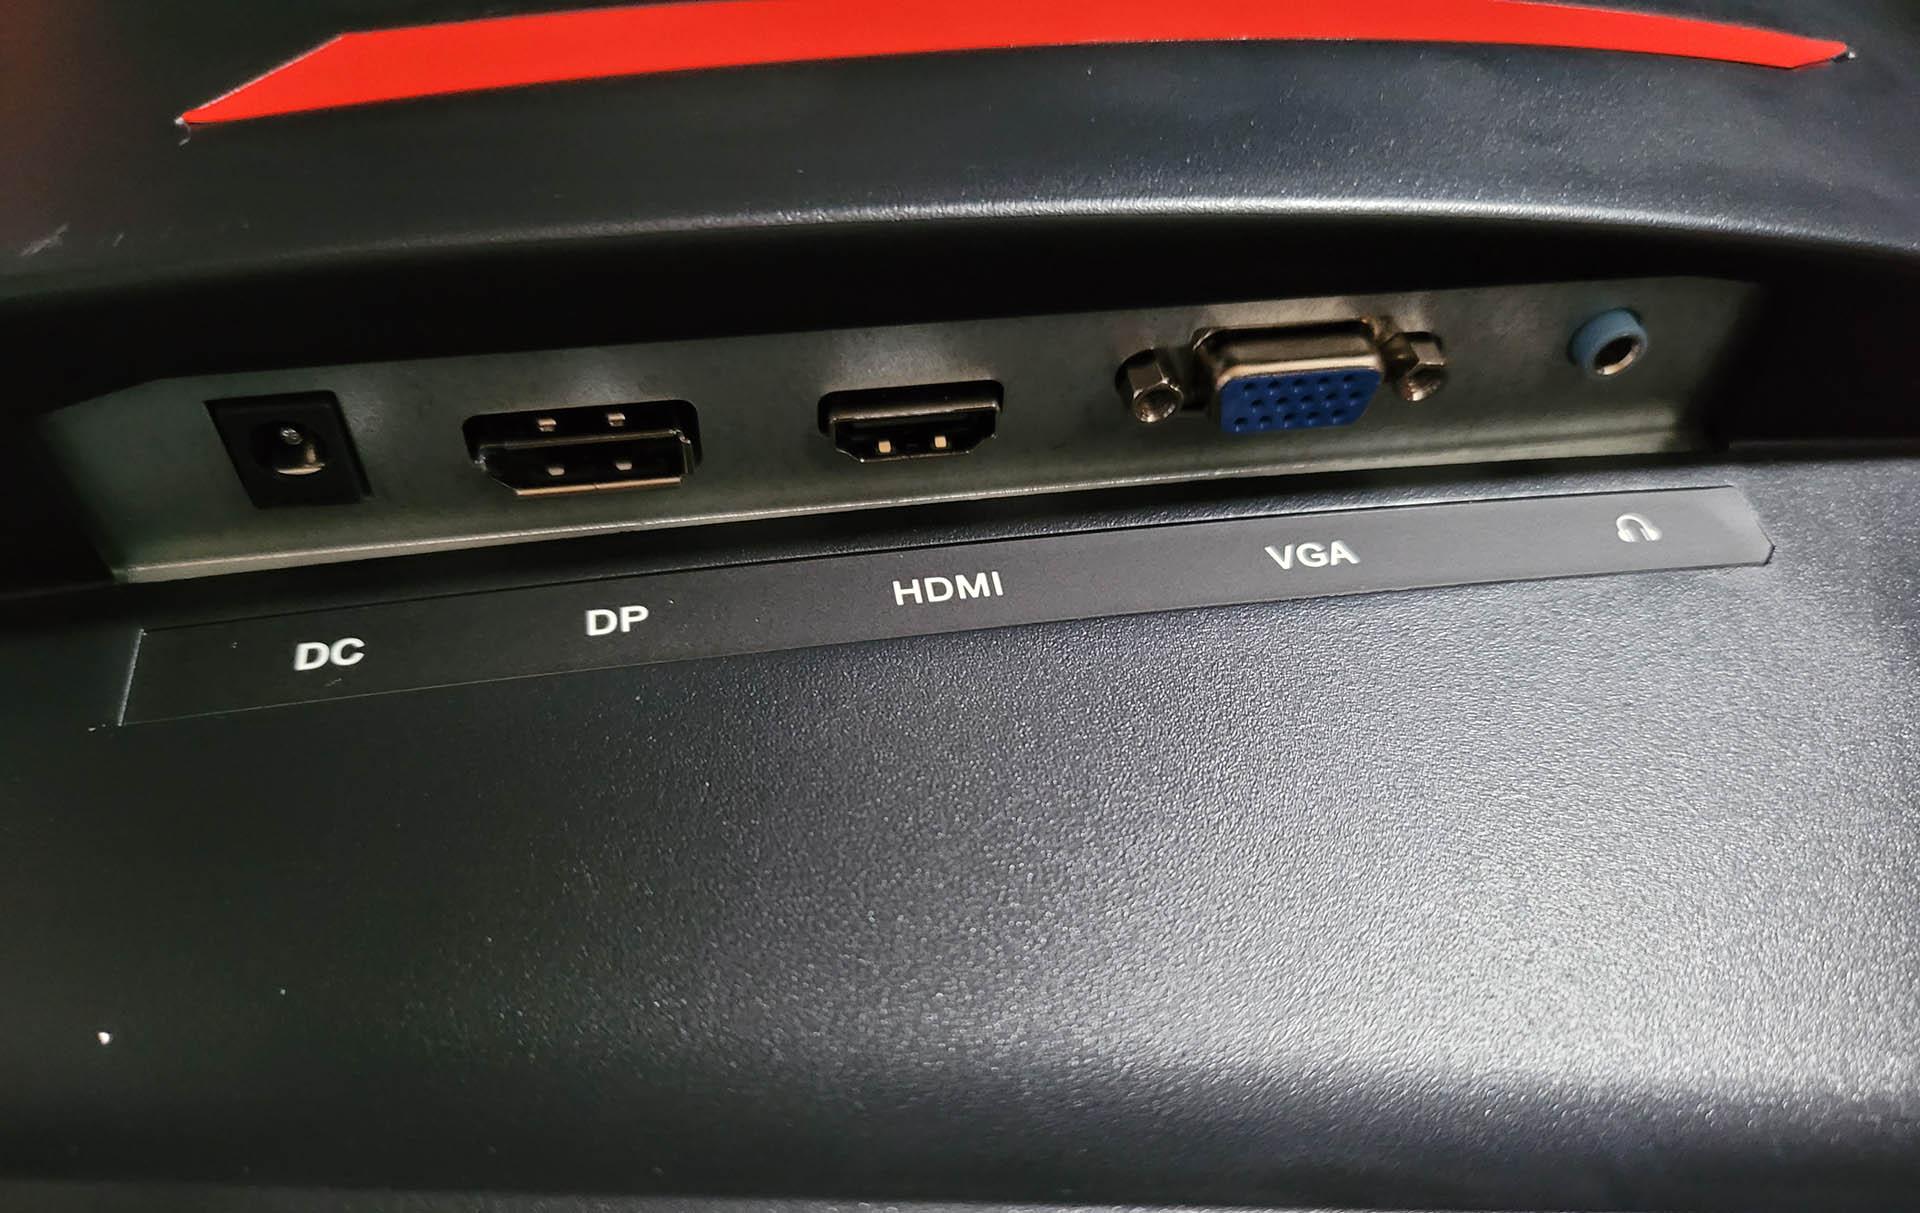 Konic 27'' Full HD Curved Gaming Monitor